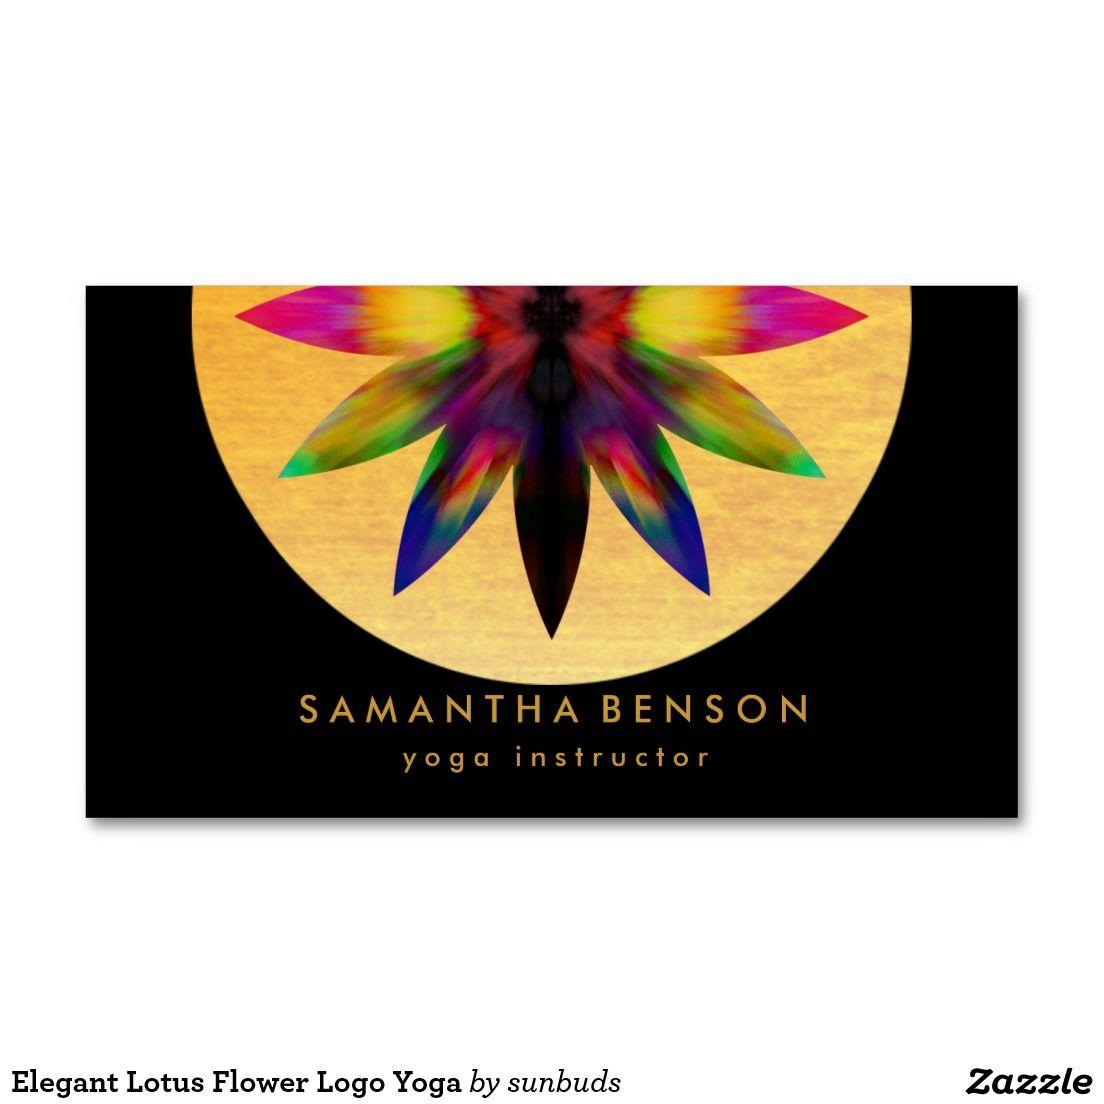 Elegant Lotus Flower Logo Yoga Business Card | Yoga, Business and ...